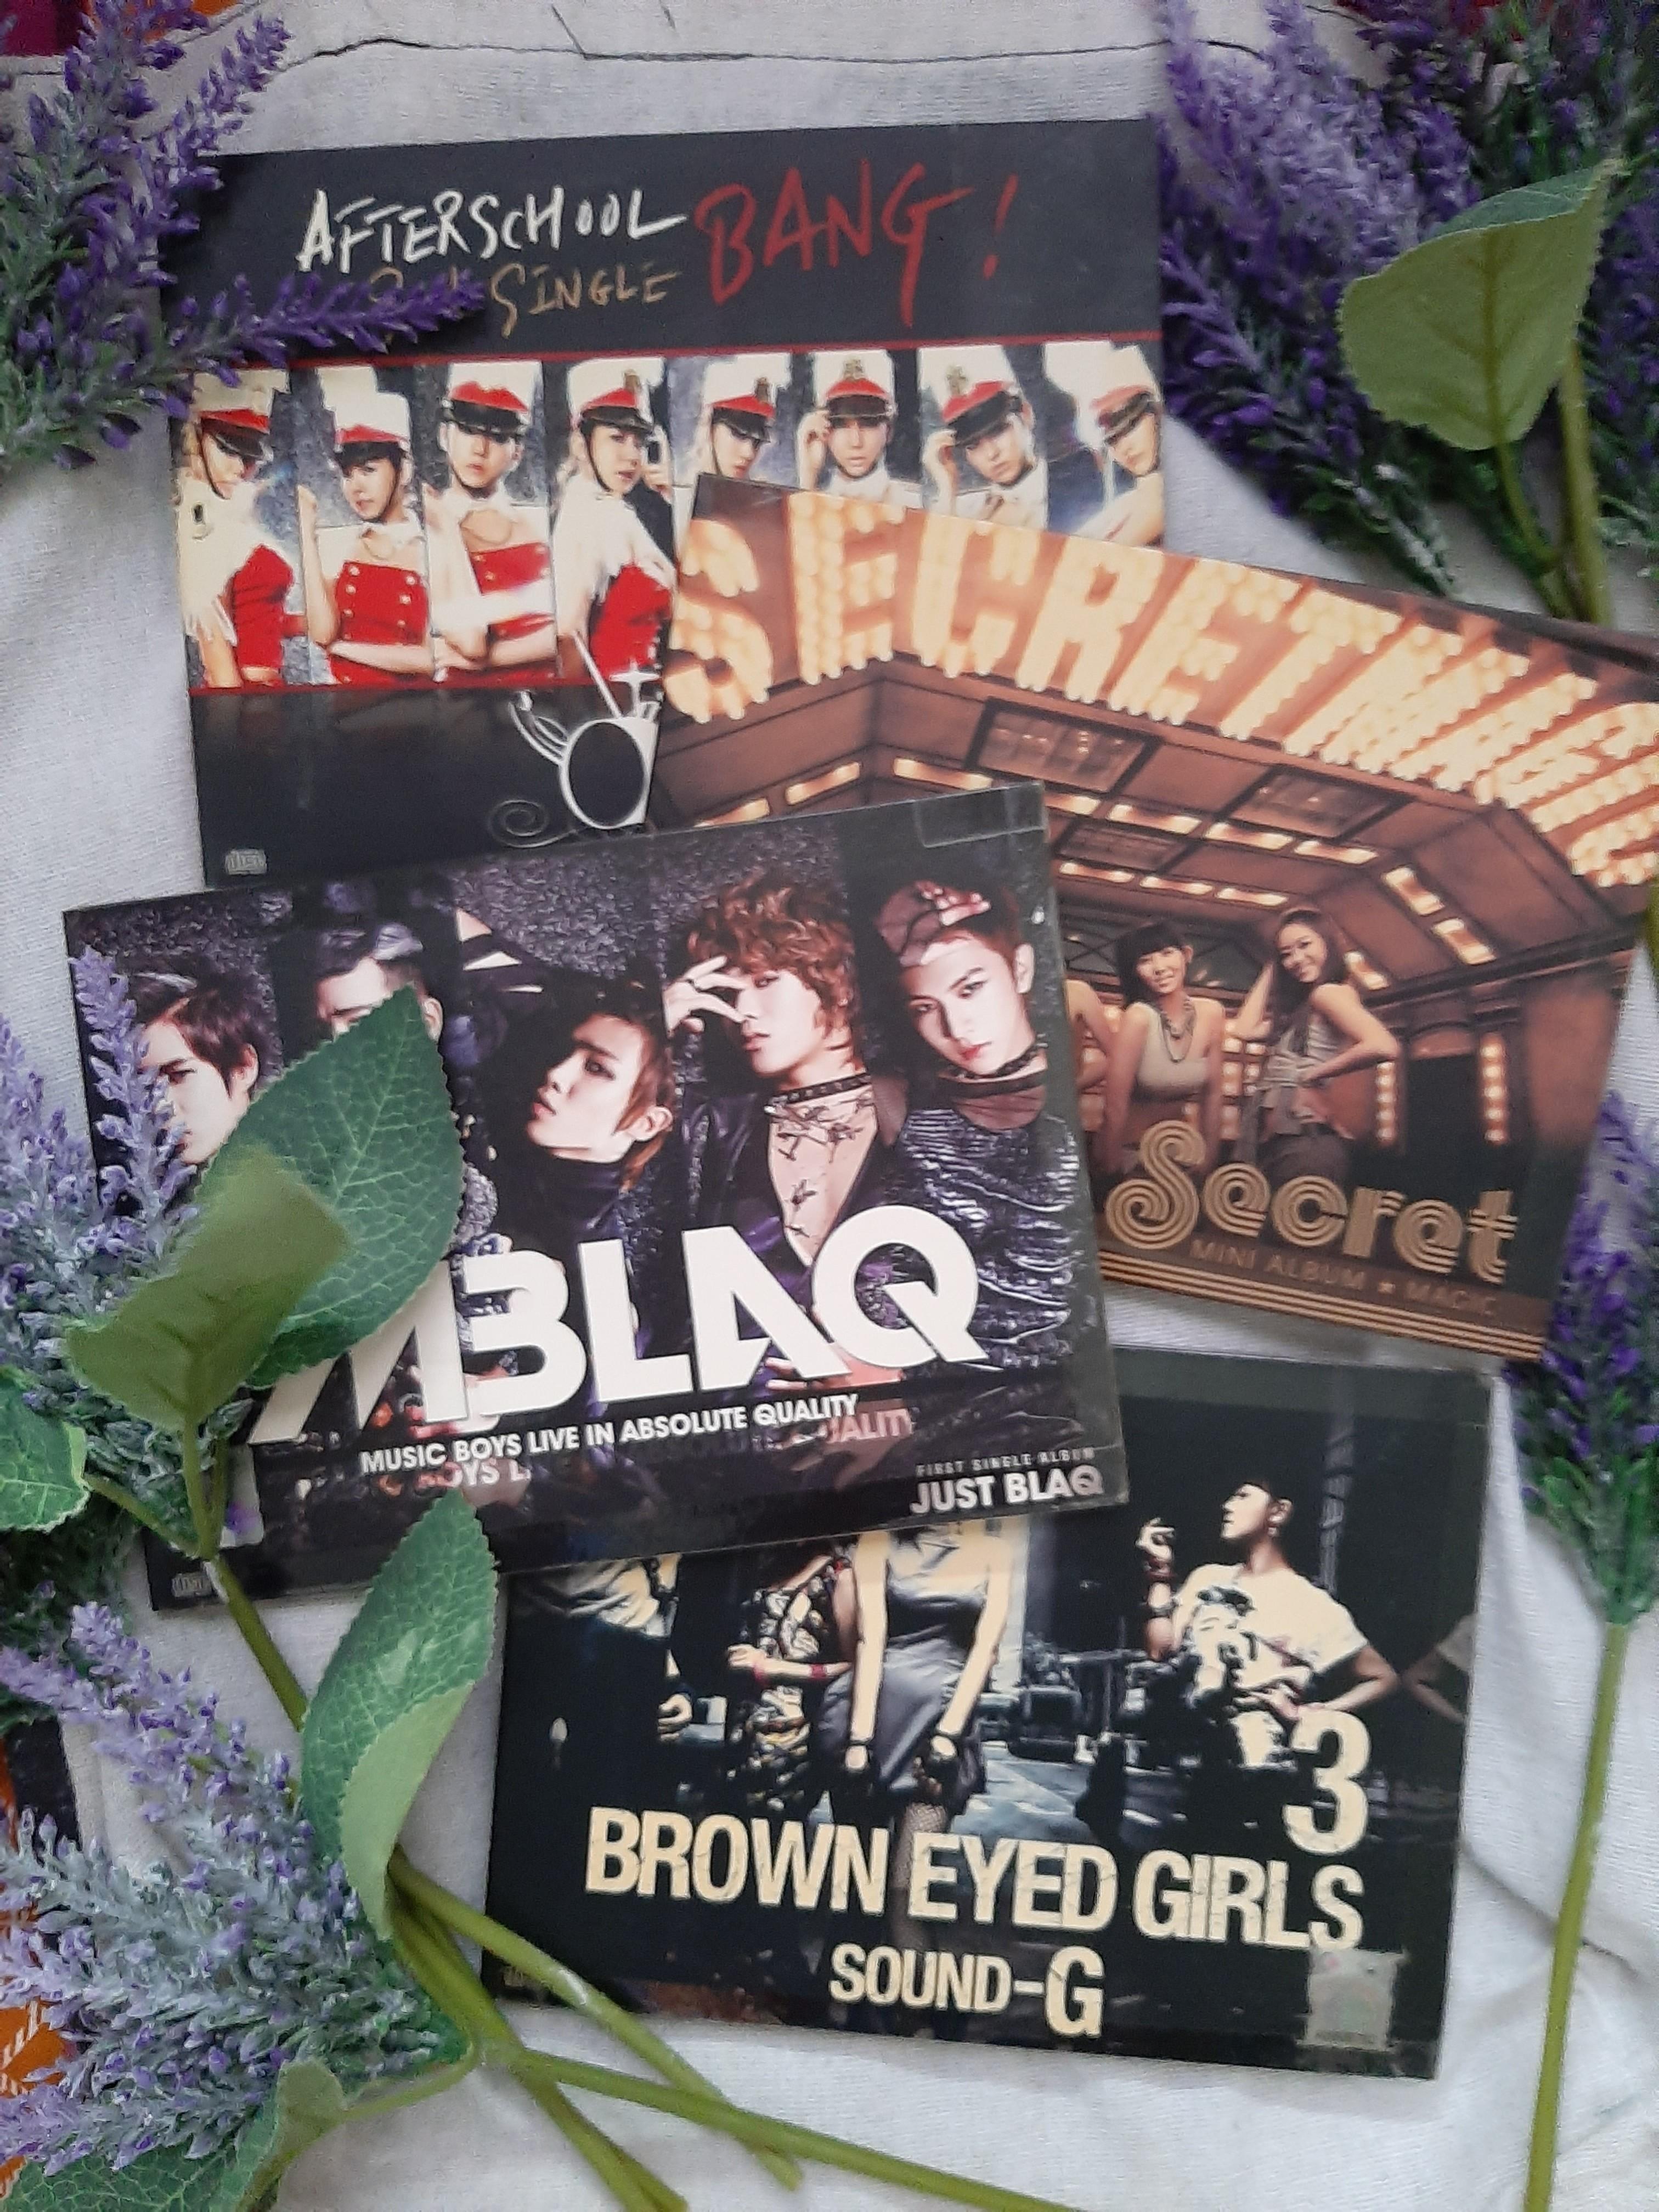 WTS Assorted Kpop Album (After School, Secret, MBLAQ, Brown eyed girls (BEG))